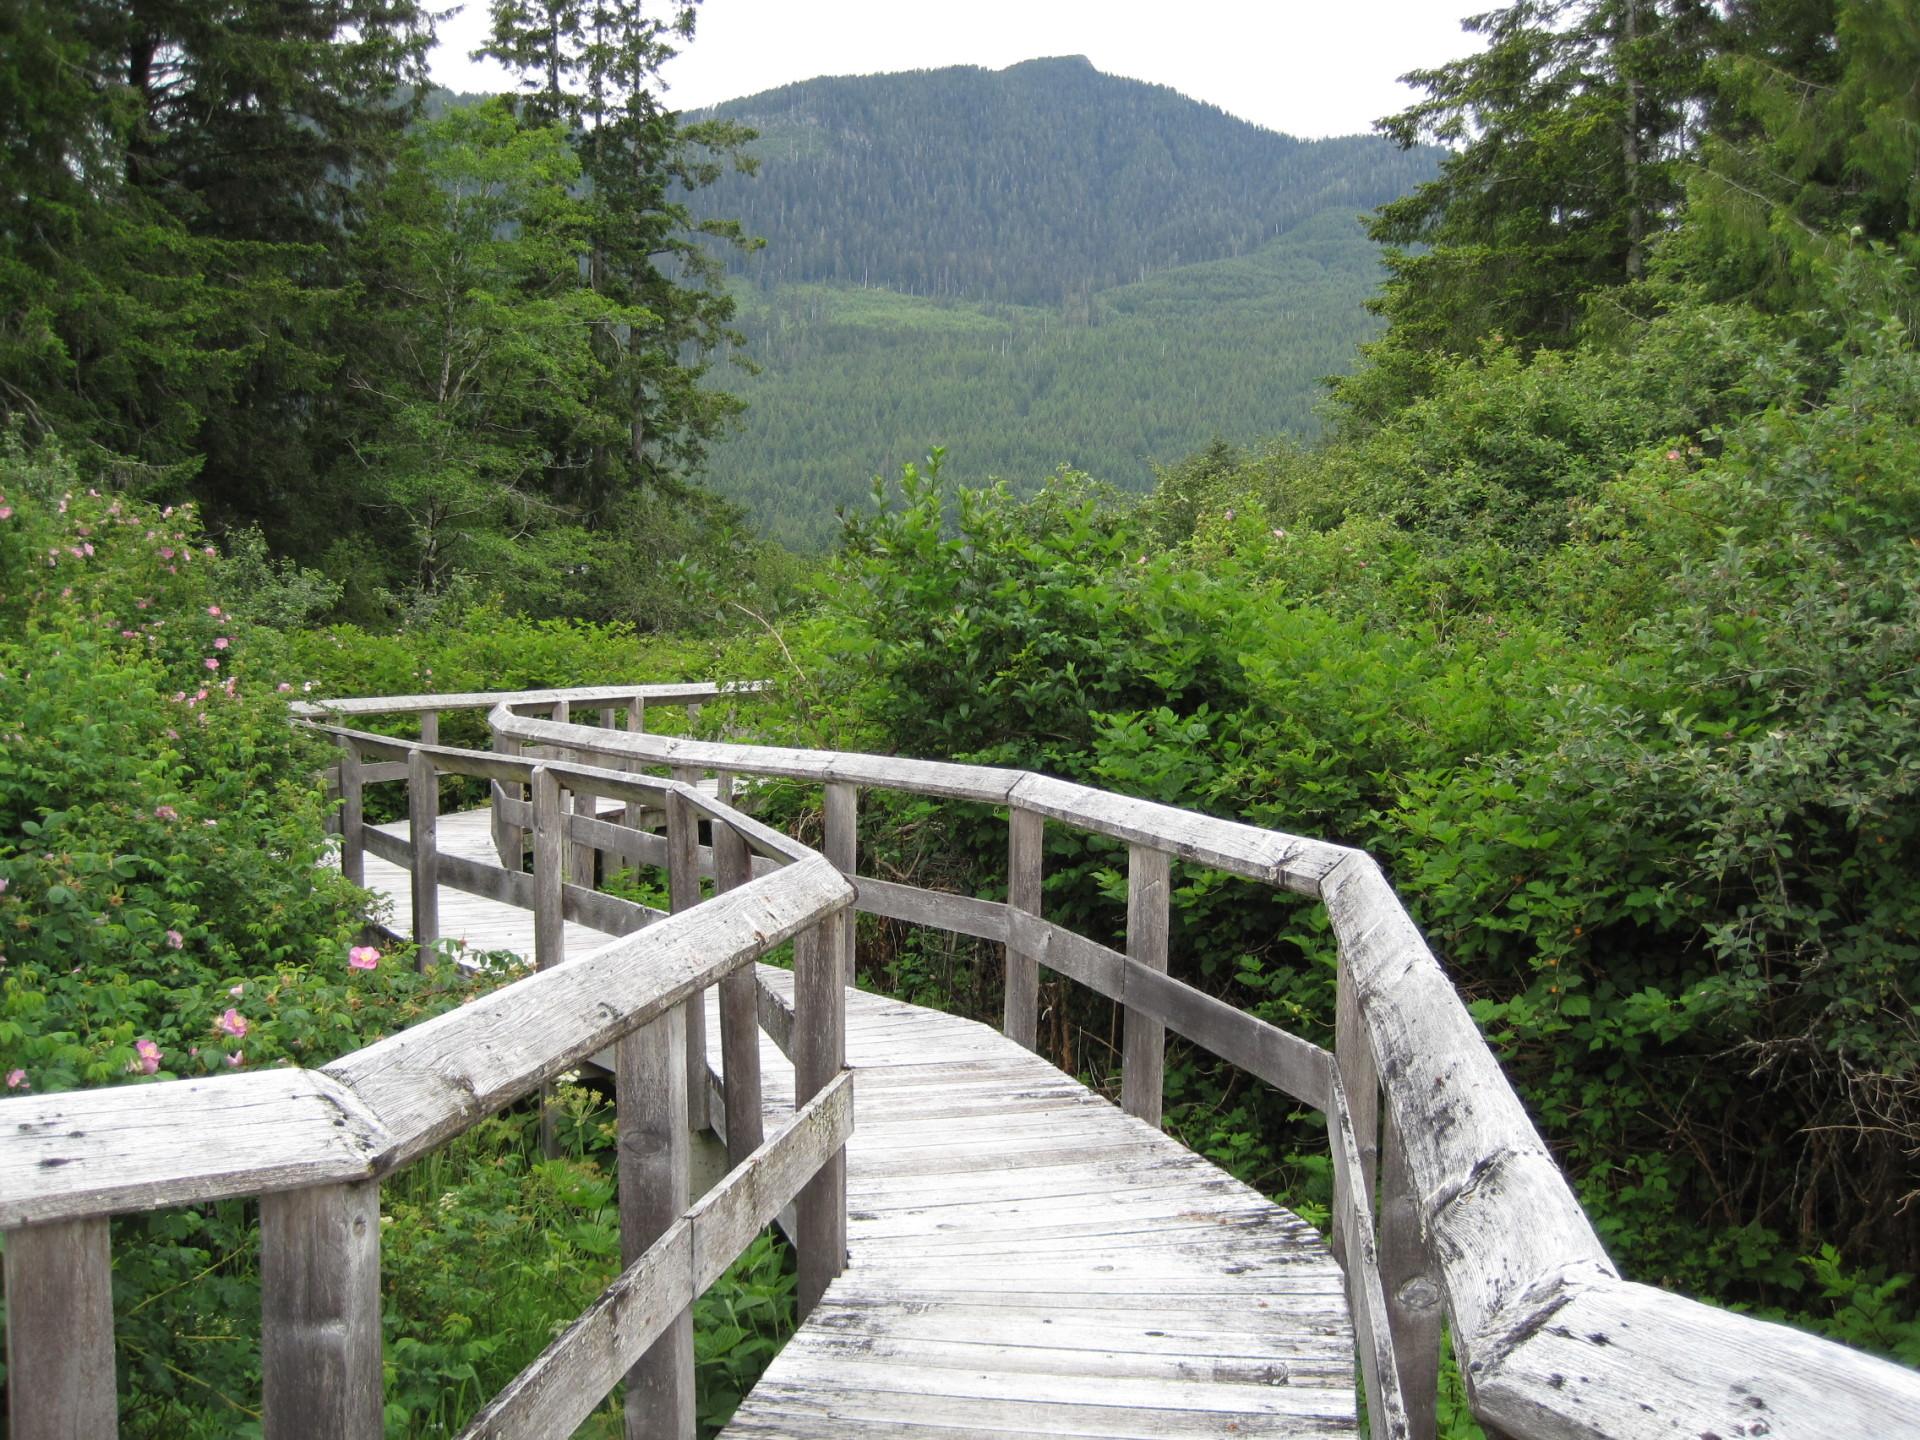 Boardwalk to lookout, Leiner River Estuary Trail